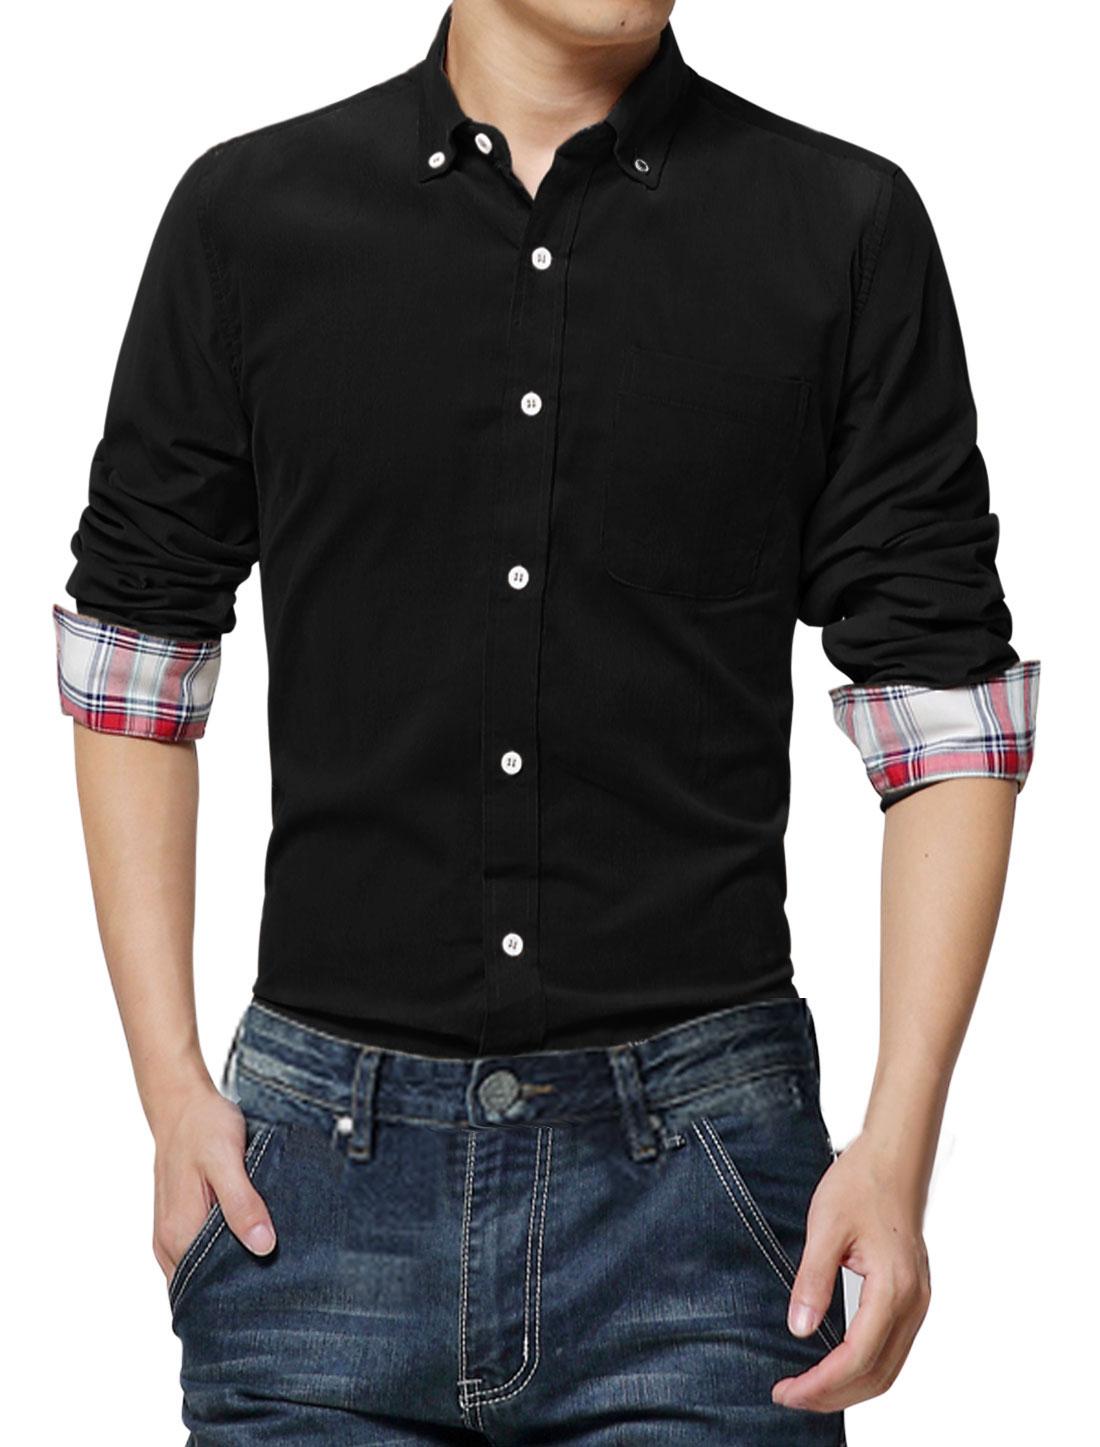 Stylish Long Sleeves Button Cuffs Black Corduroy Shirt for Man M